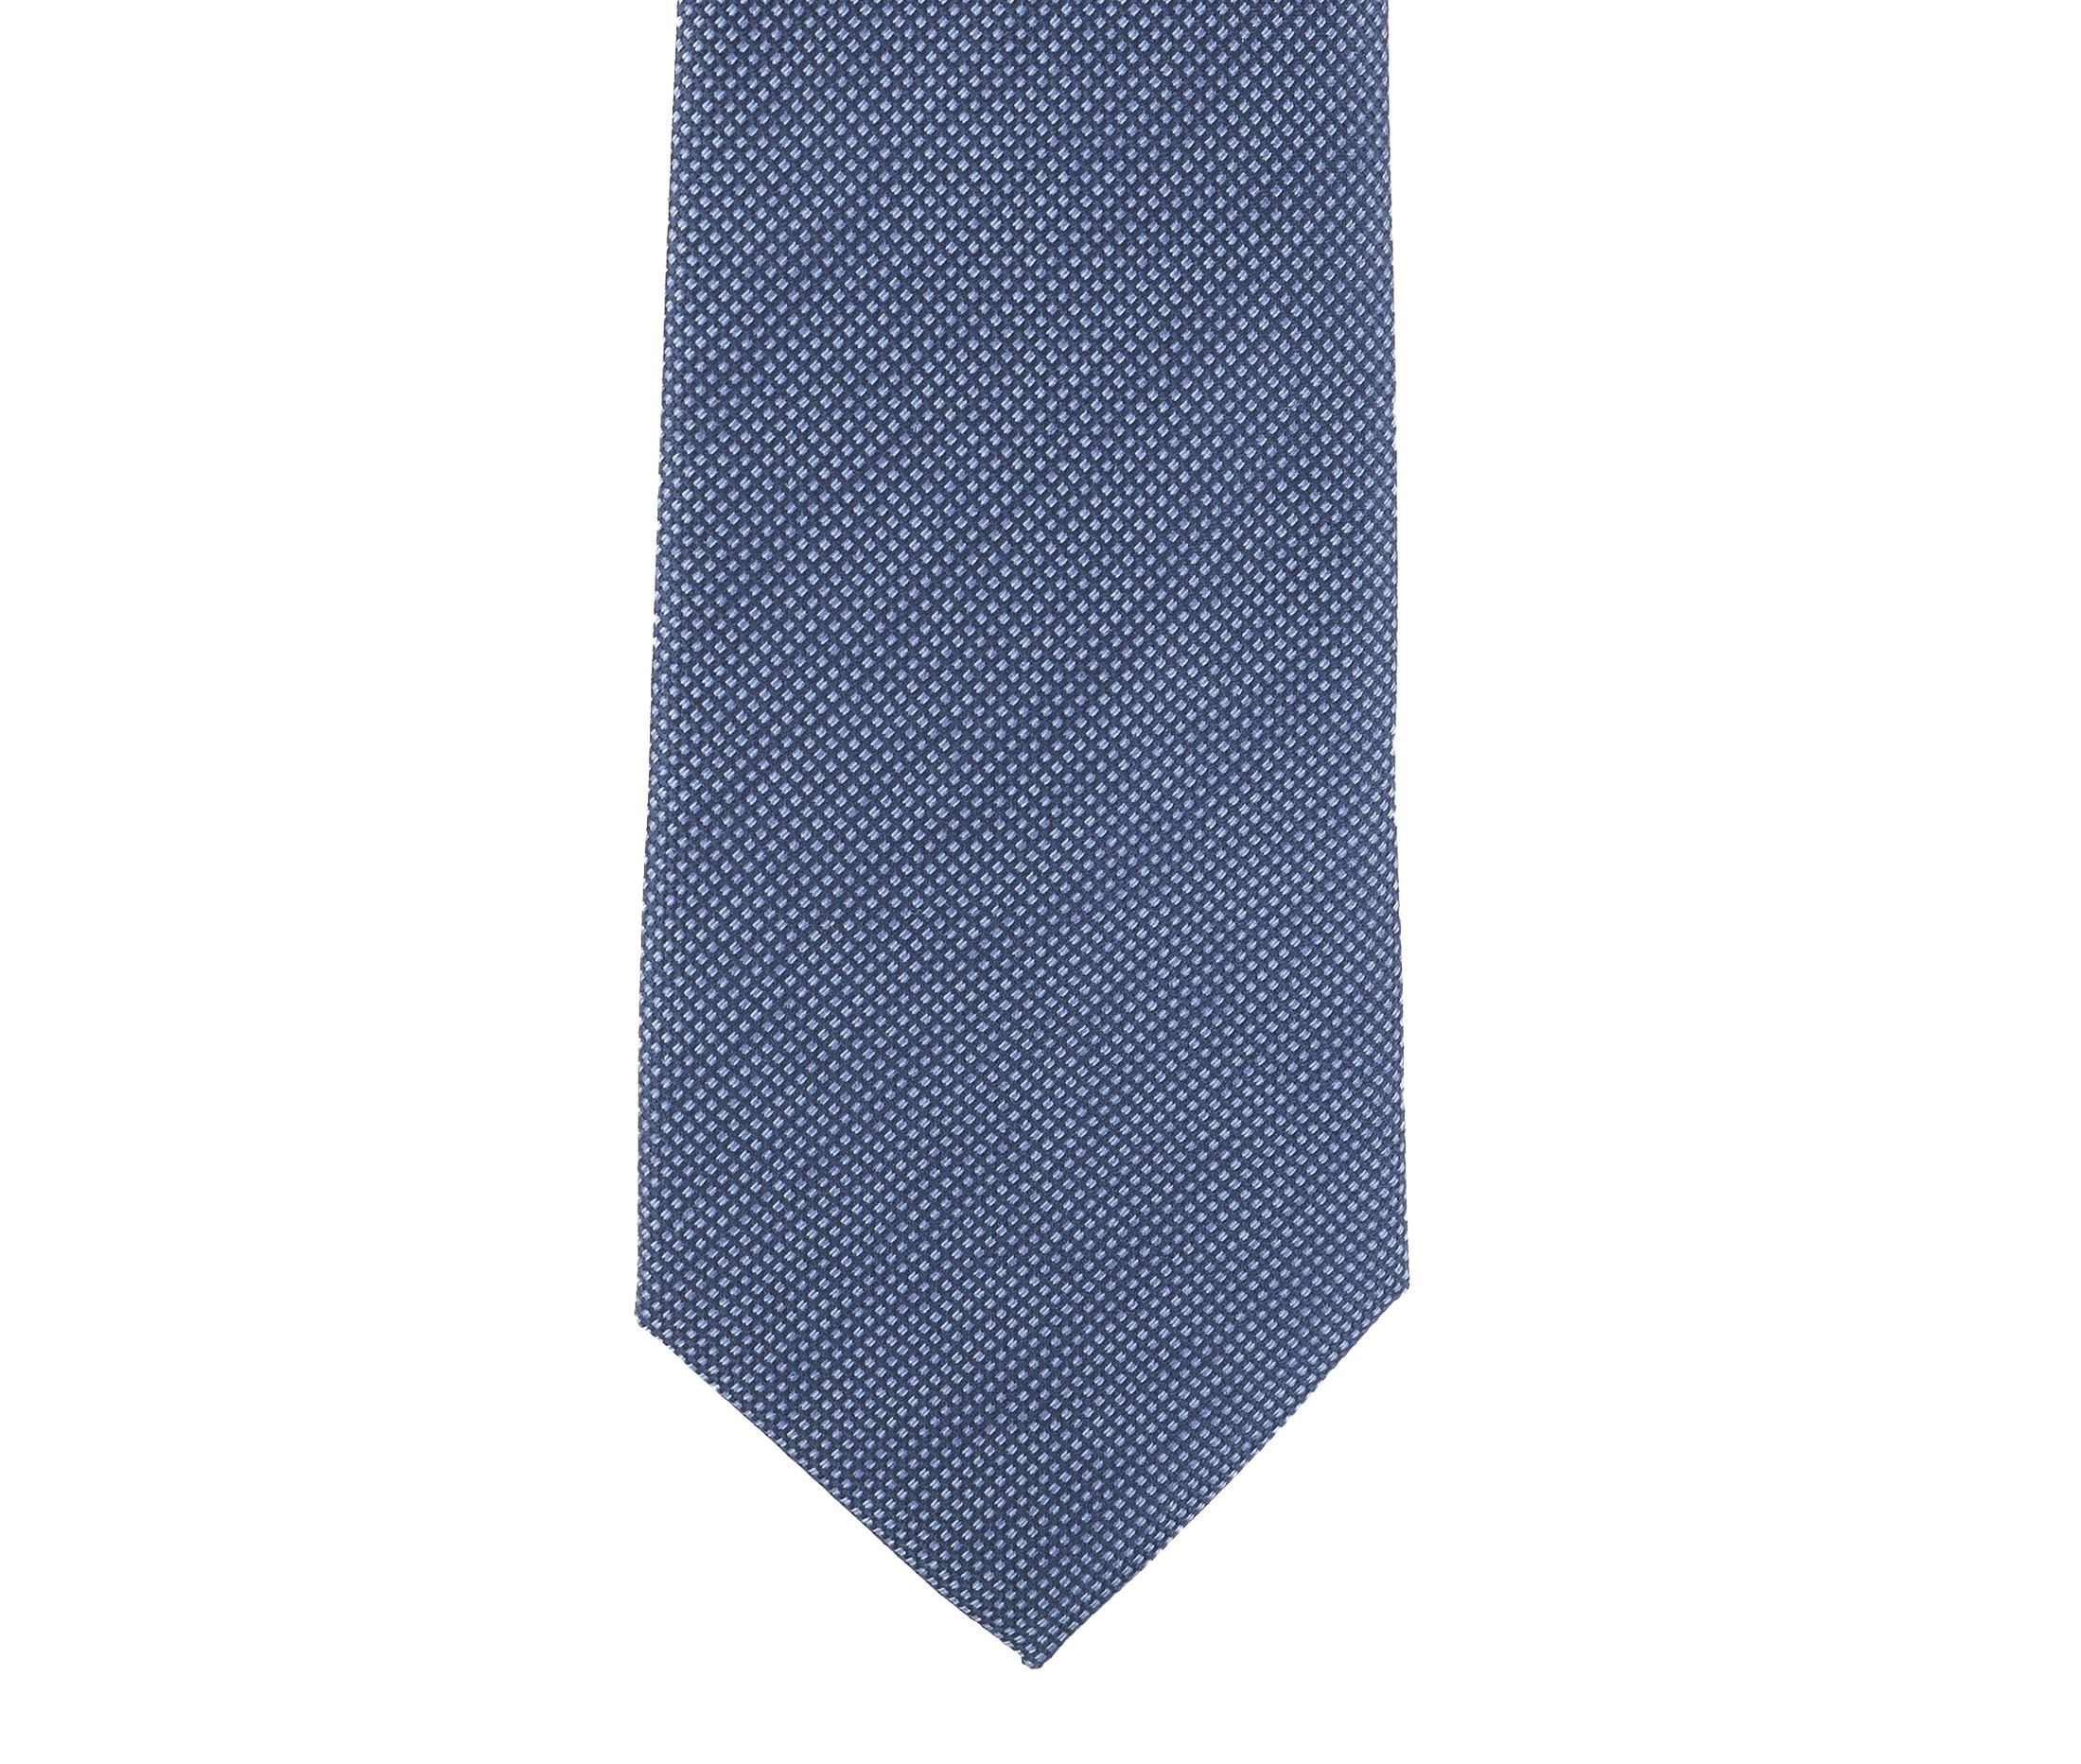 Krawatte Seide Pinpoint Dunkeblau 9-17 foto 1